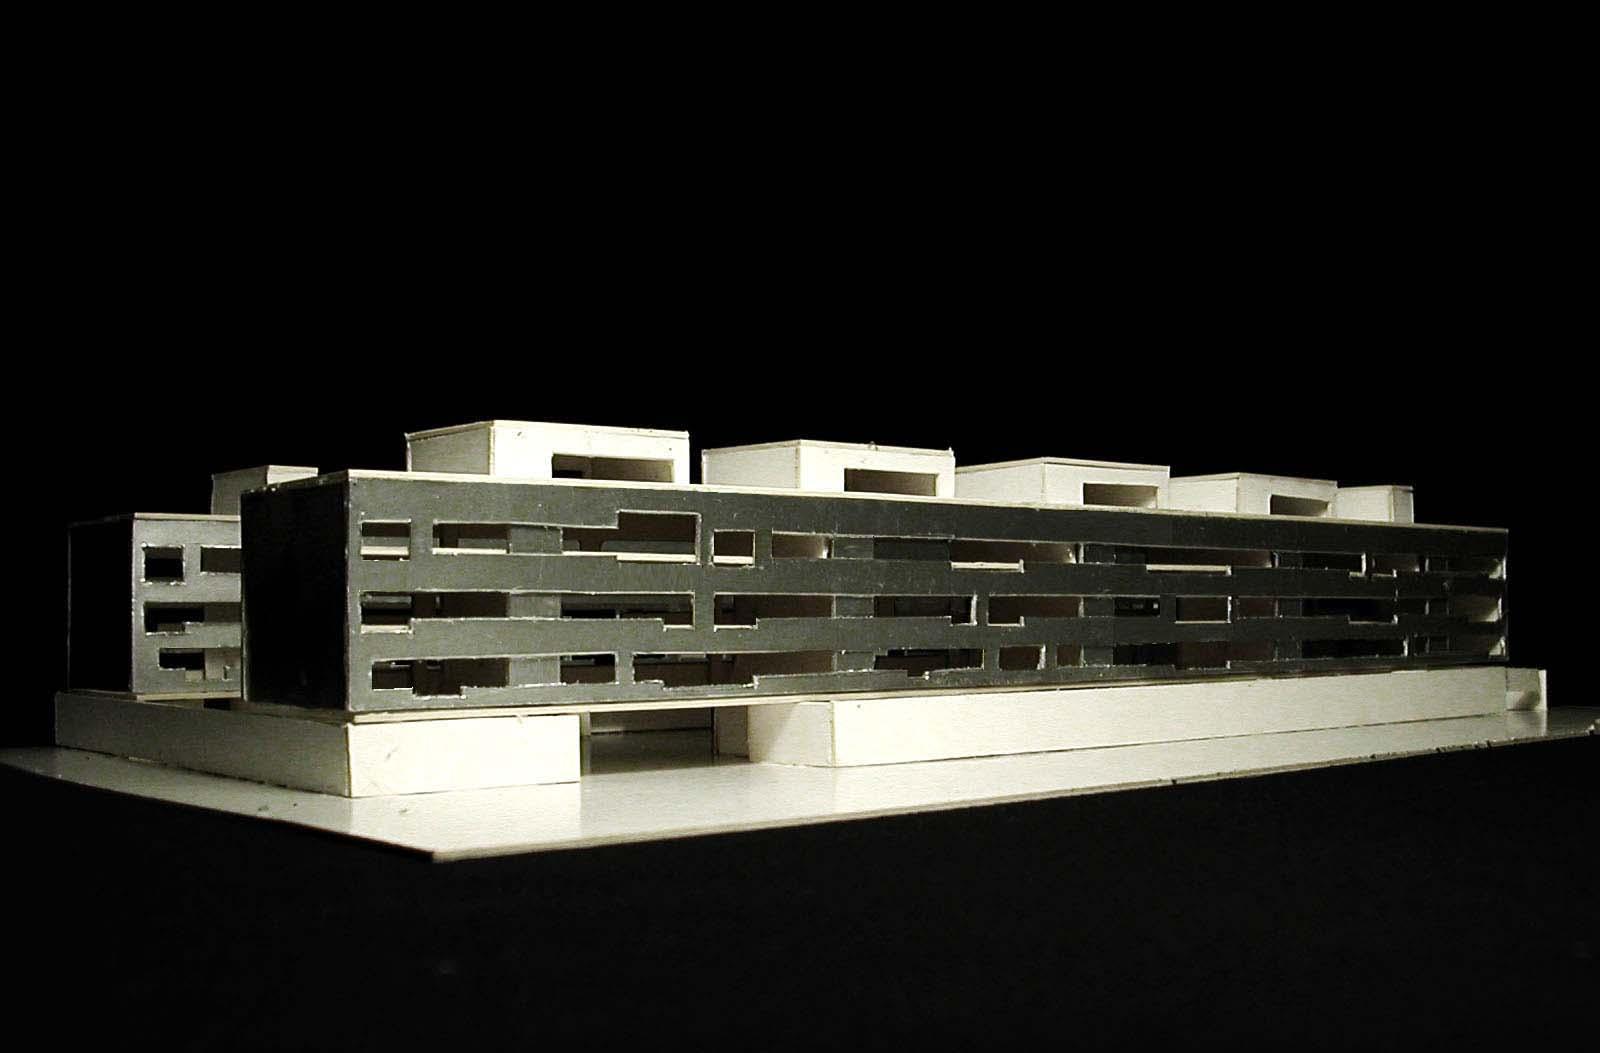 CARABANCHEL MC BUILDING. 71 DWELLINGS | Madrid